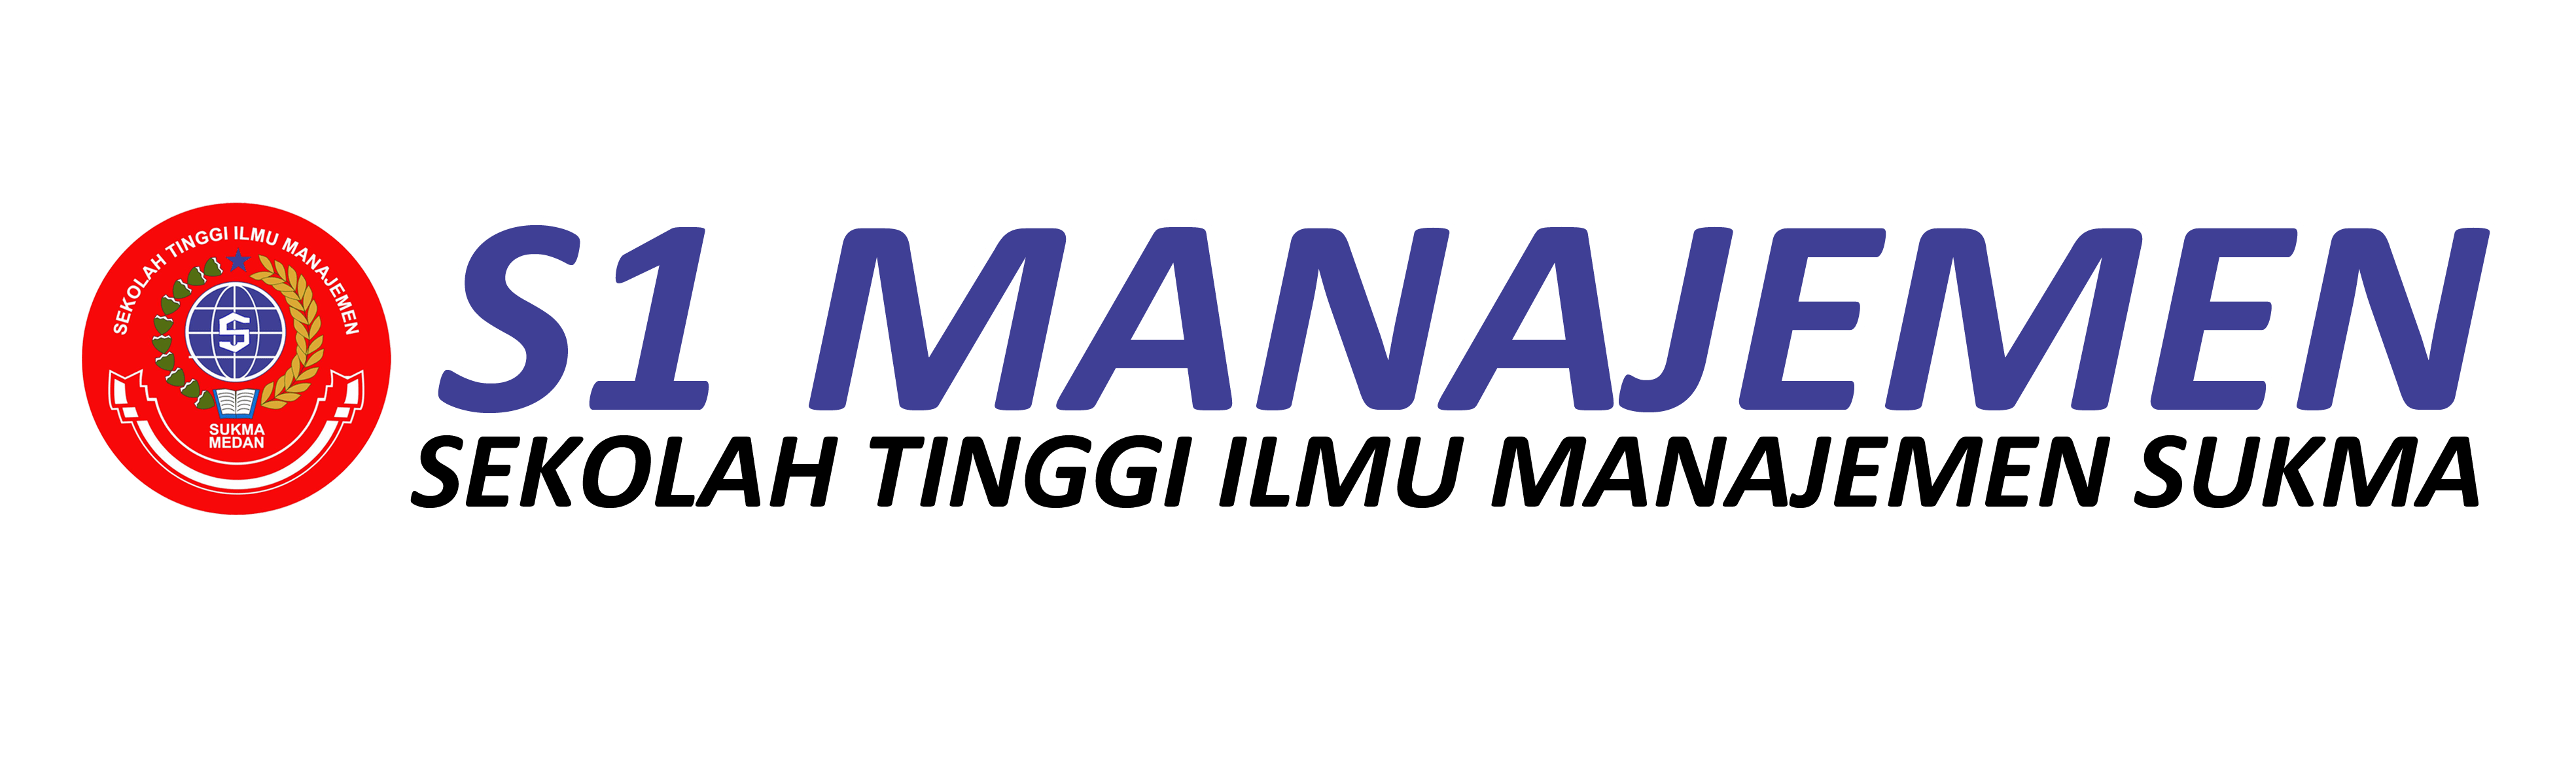 S1 Manajemen STIM SUKMA Medan